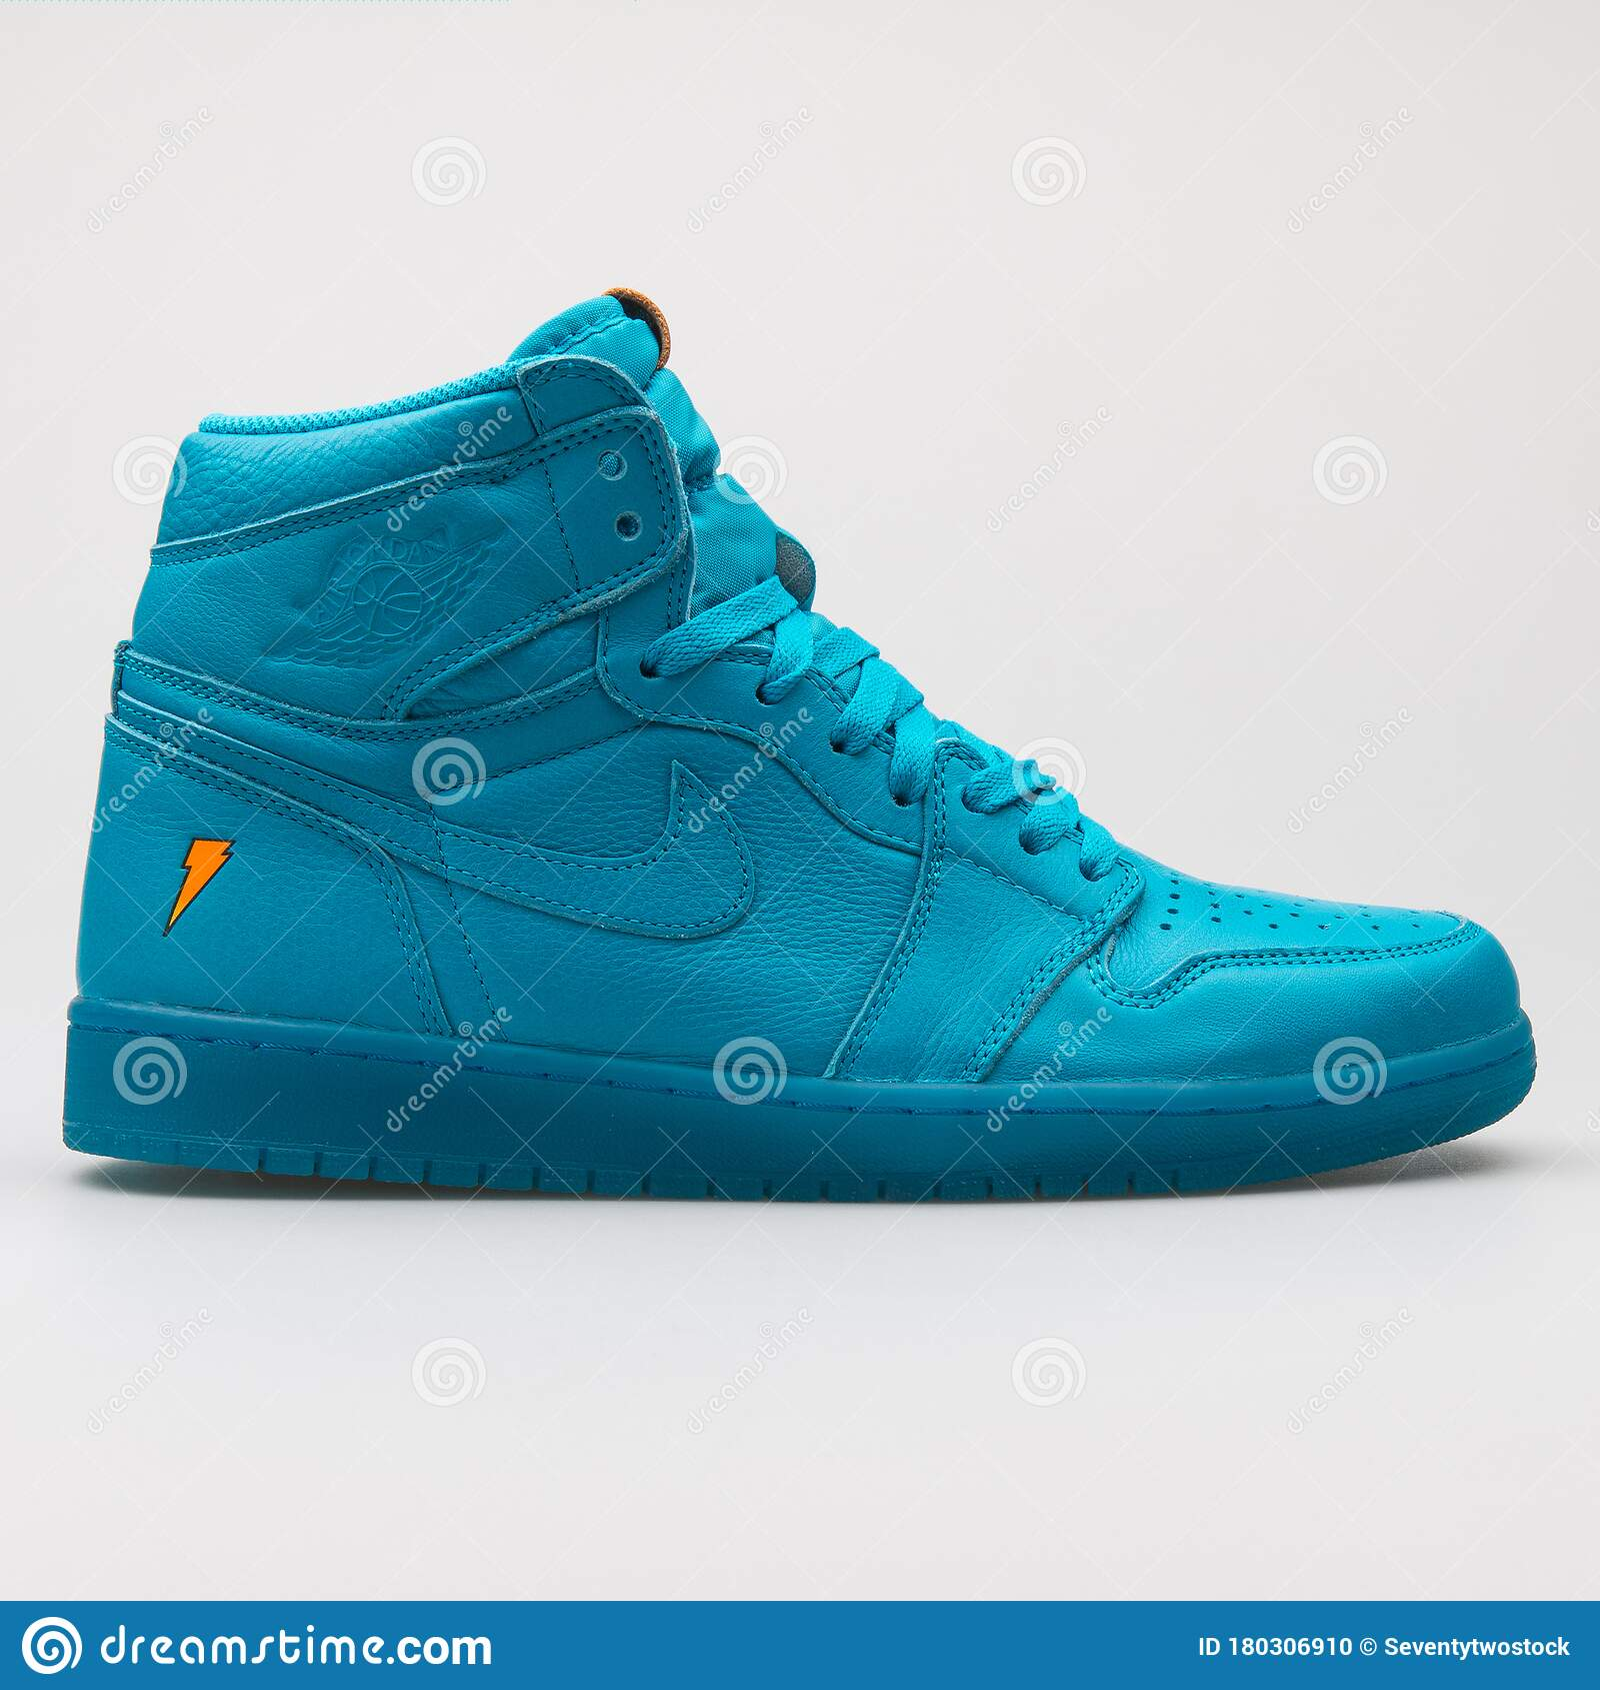 Nike Air Jordan 1 Retro High OG G8RD Blue Lagoon Sneaker Editorial ...